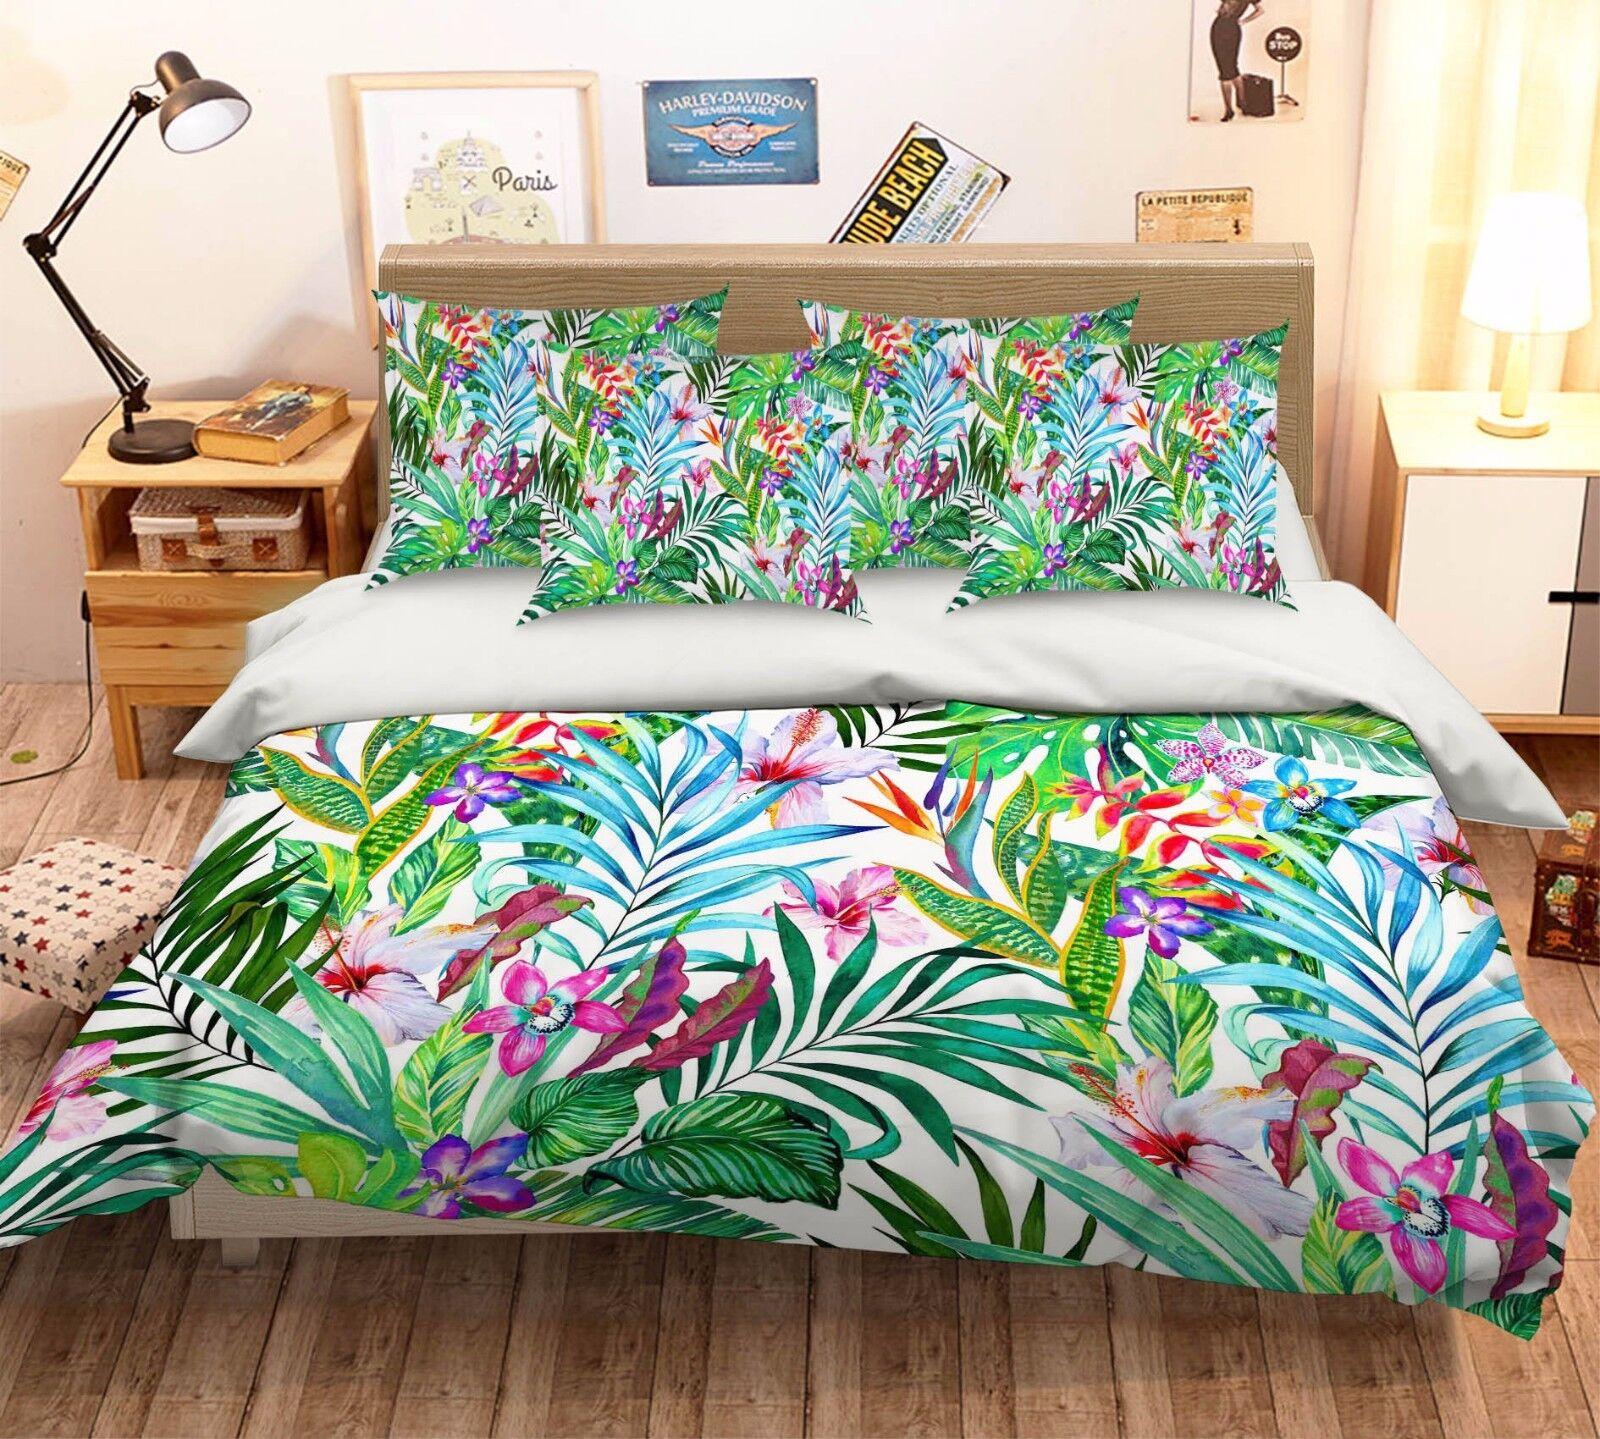 3D Plants Flower Bett Pillowcases Quilt Duvet Startseite Set Single Königin König Größe AU